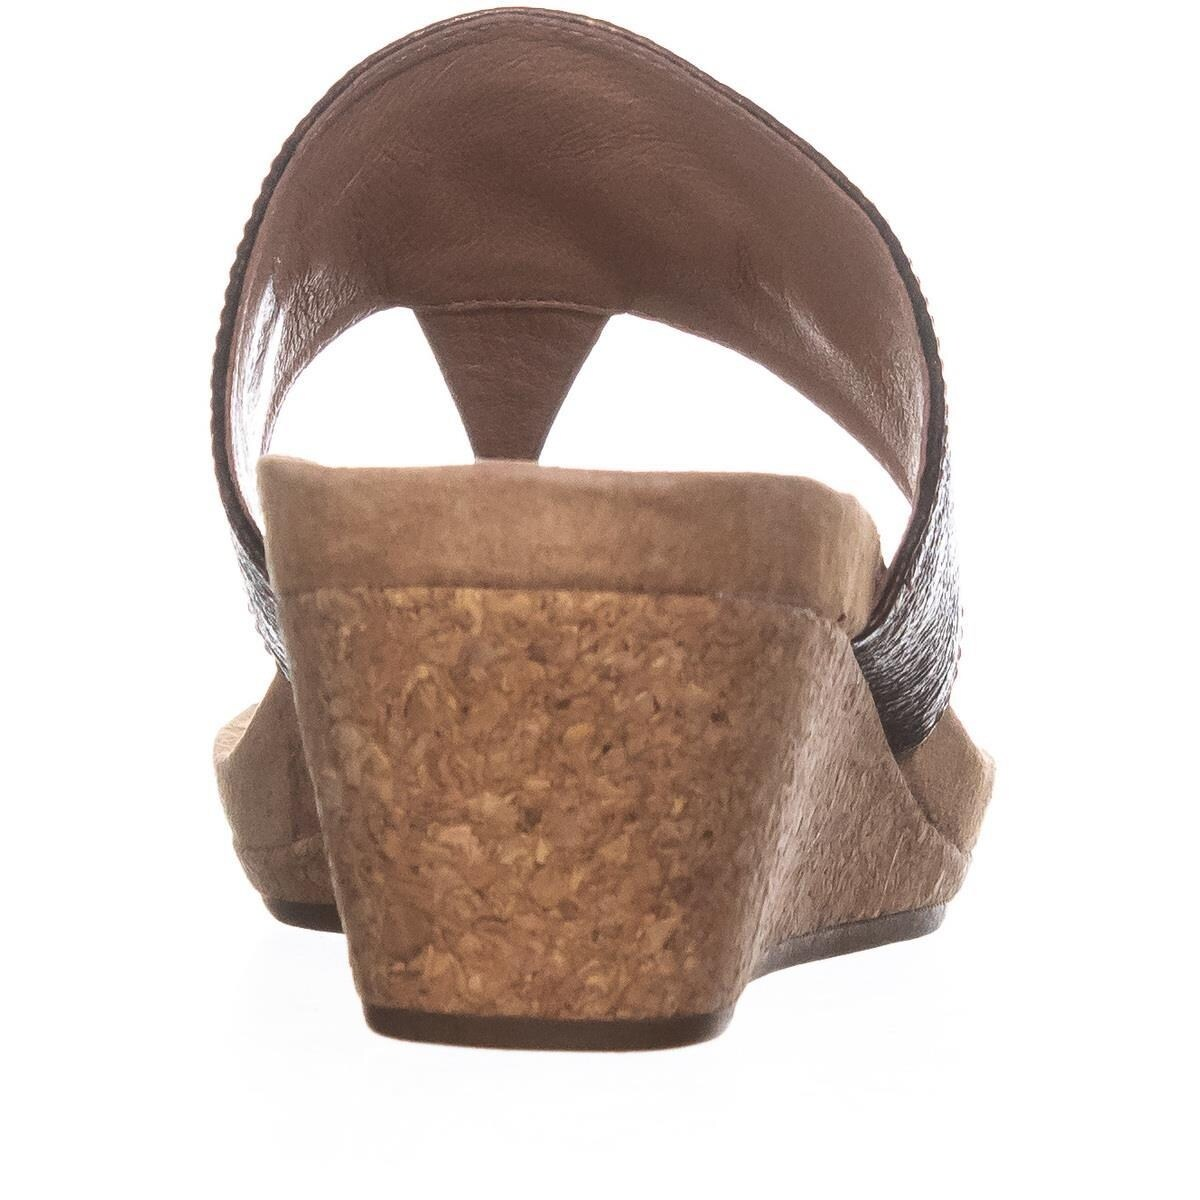 4b00af84664 UGG Briella Wedge Thong Sandals, Pony Brown - 8.5 US / 39.5 EU